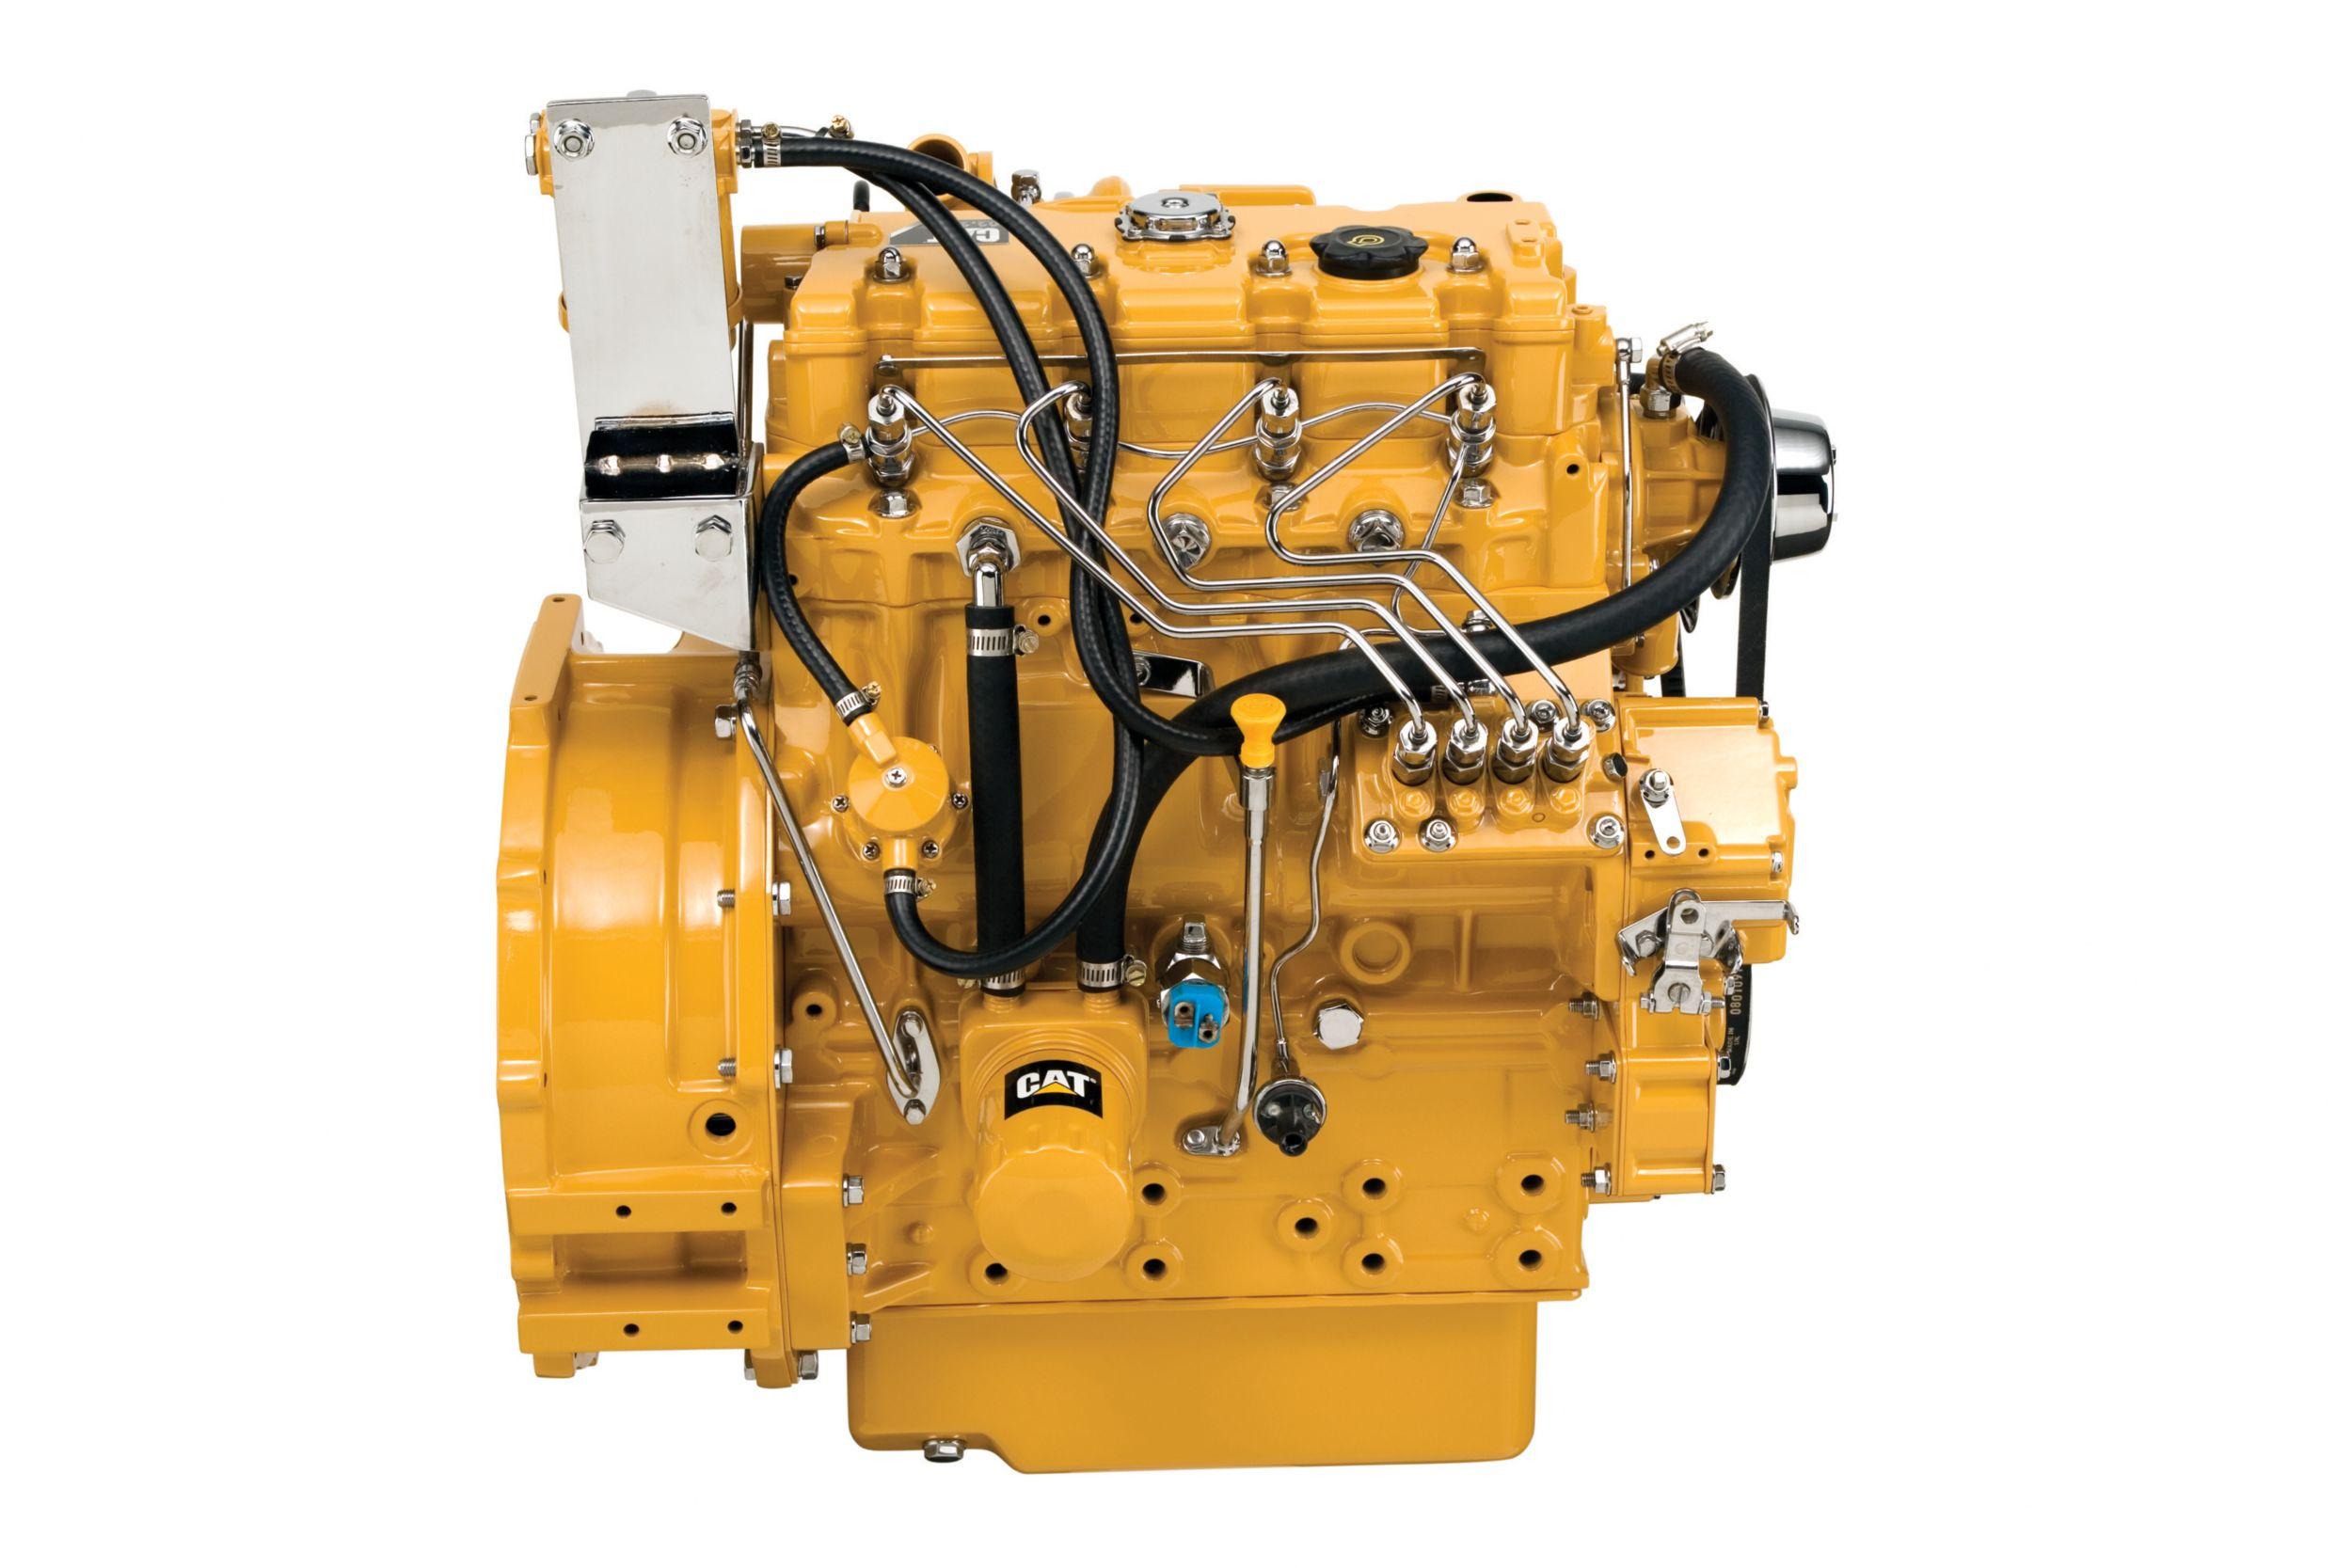 cat 3126 ipr wiring diagram #15 cat ecm pin wiring diagram cat 3126 ipr wiring diagram #15